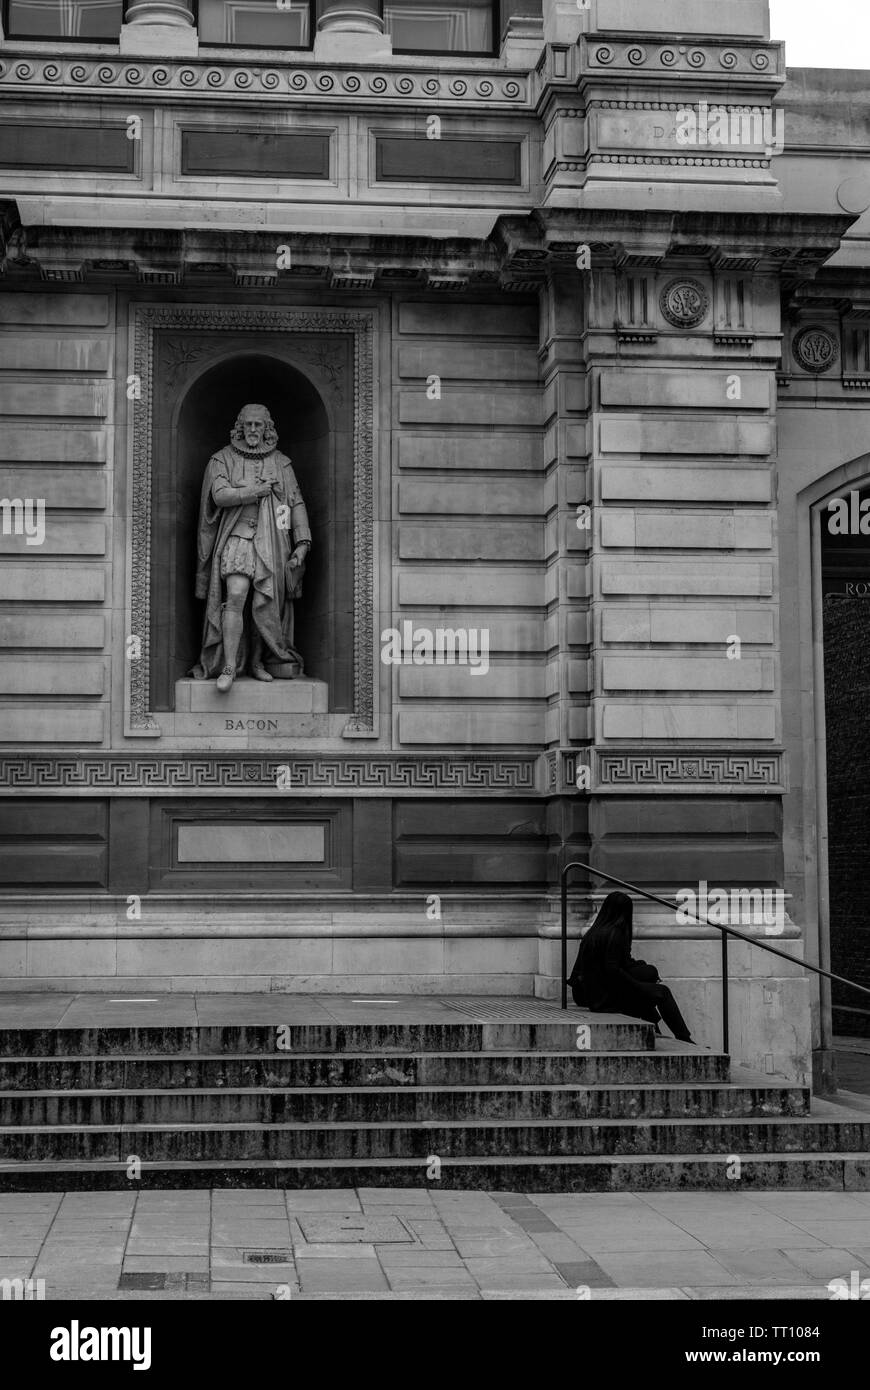 A facade of the Royal Academy of Arts, Burlington House, London, England,UK showing Francis Bacon's statue - Stock Image